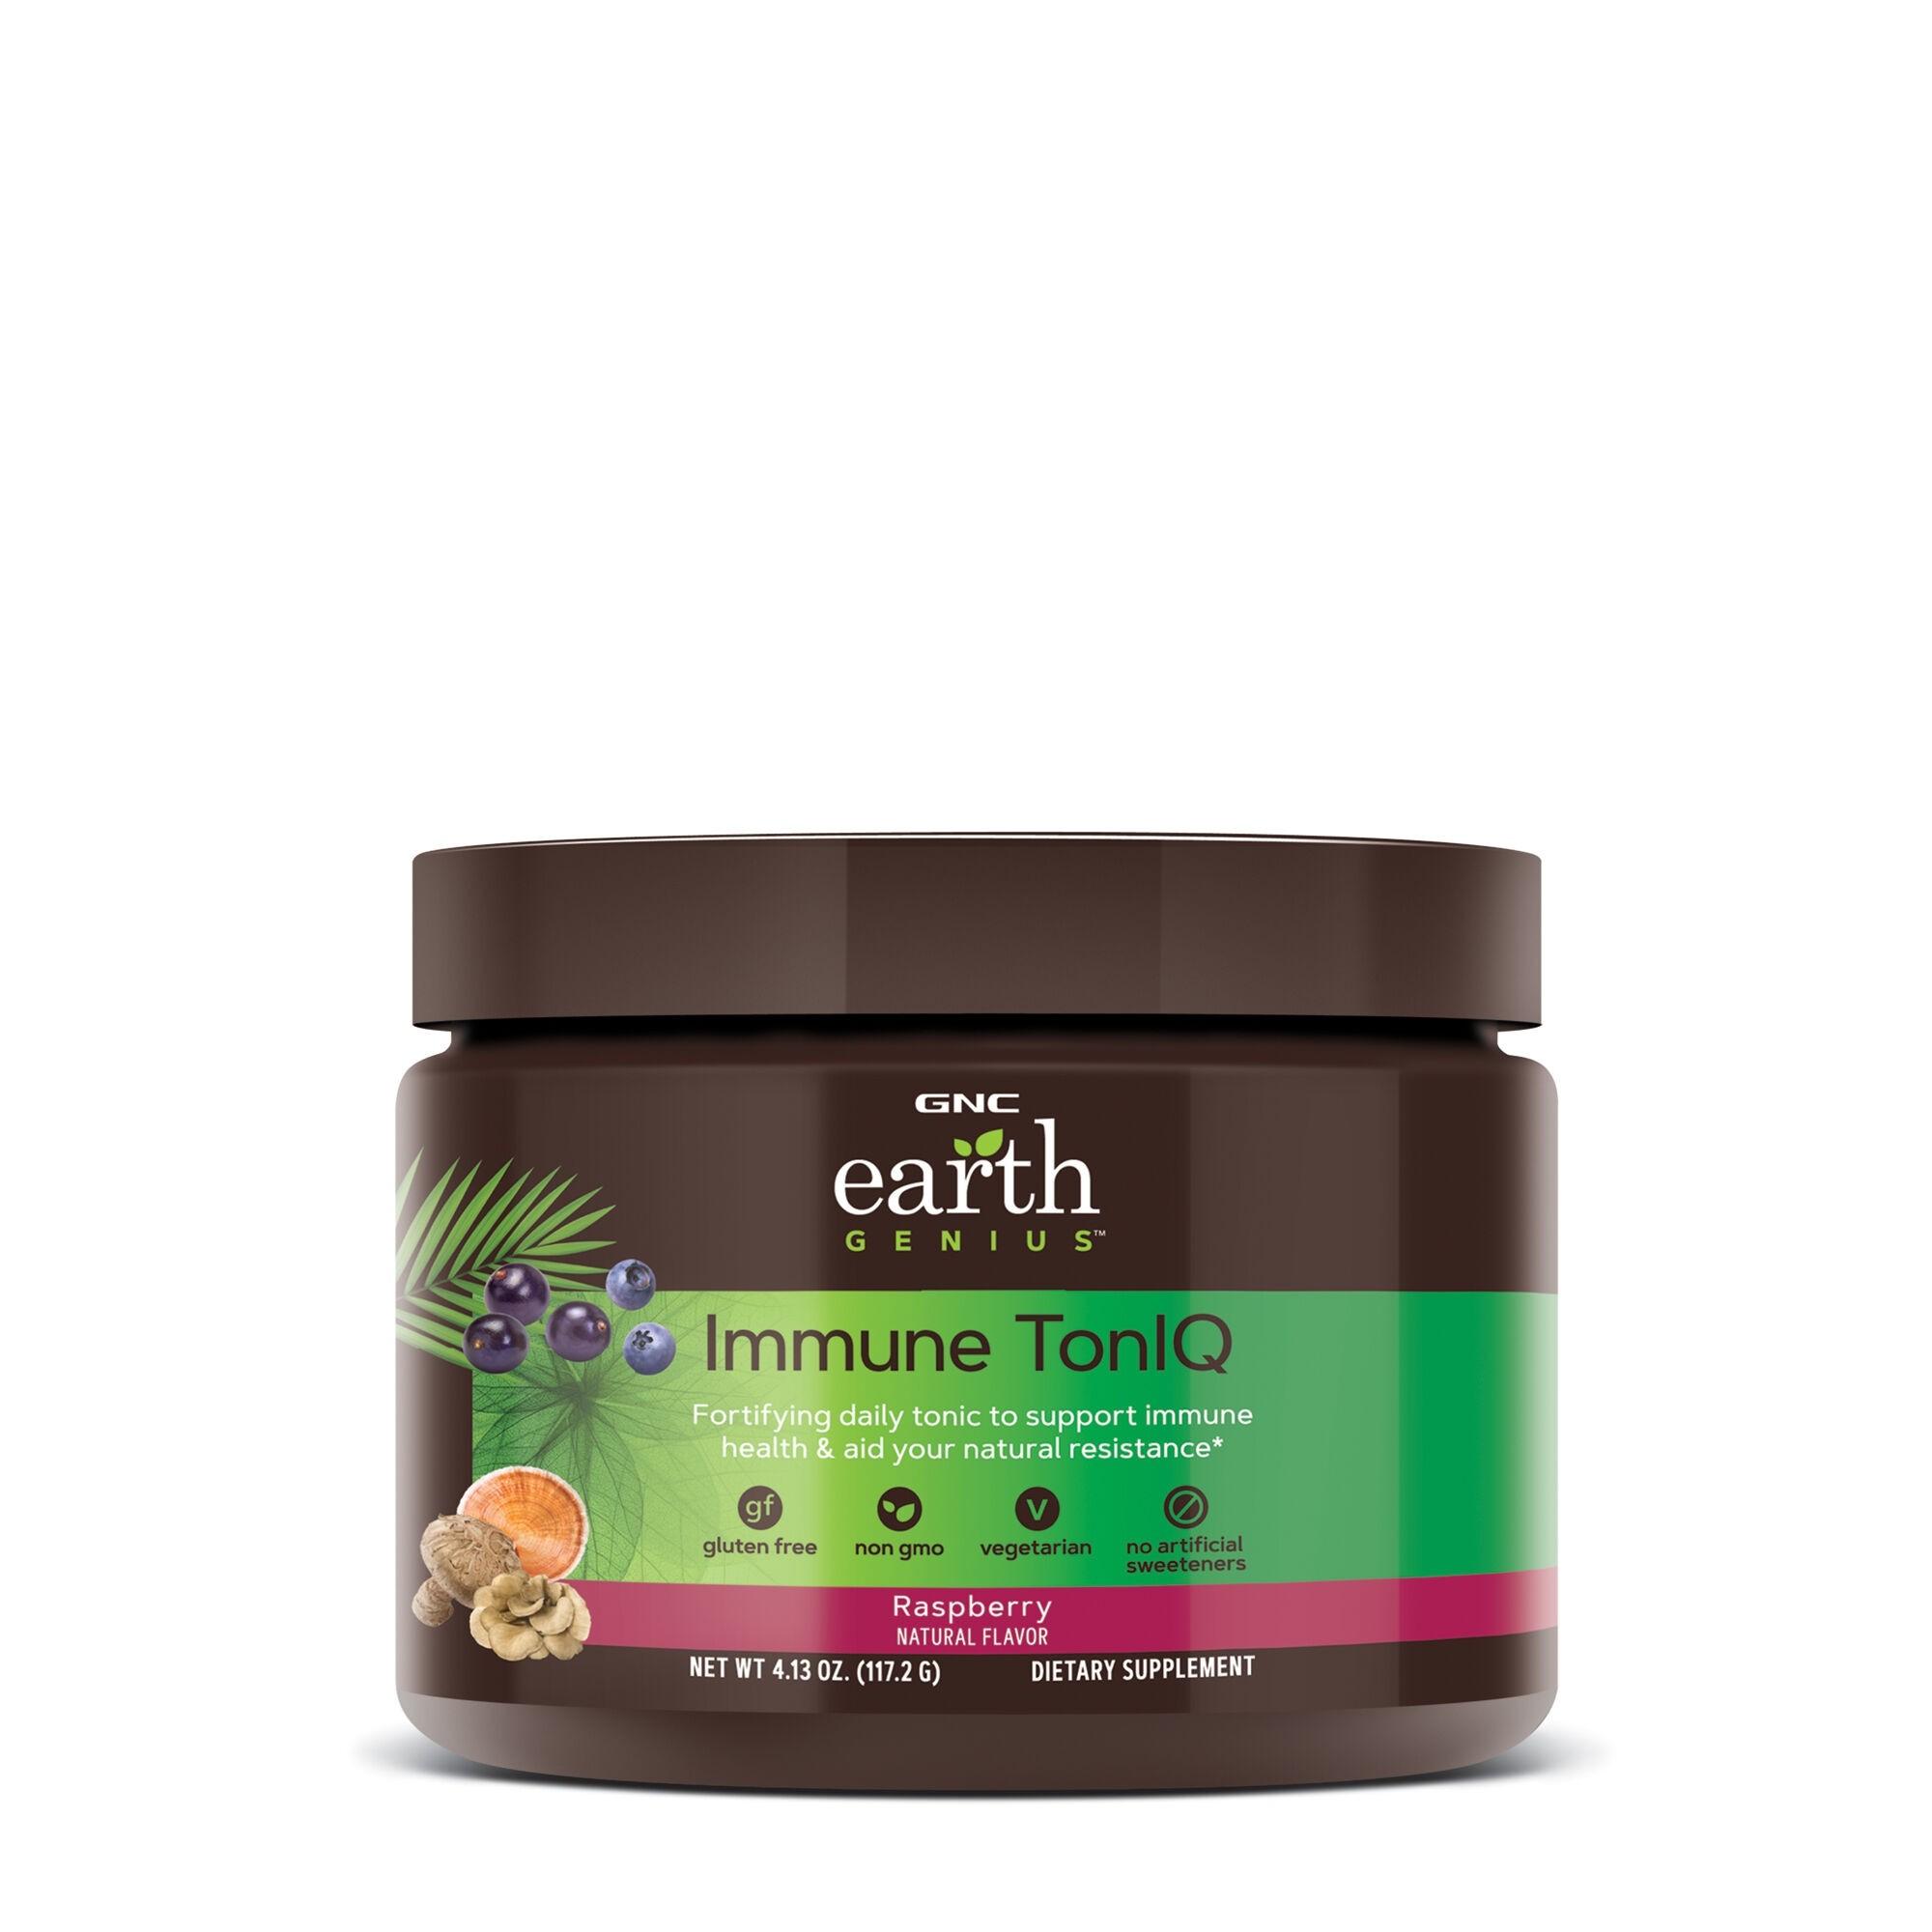 GNC Earth Genius™ Immune TonIQ - Raspberry, 117.2 g